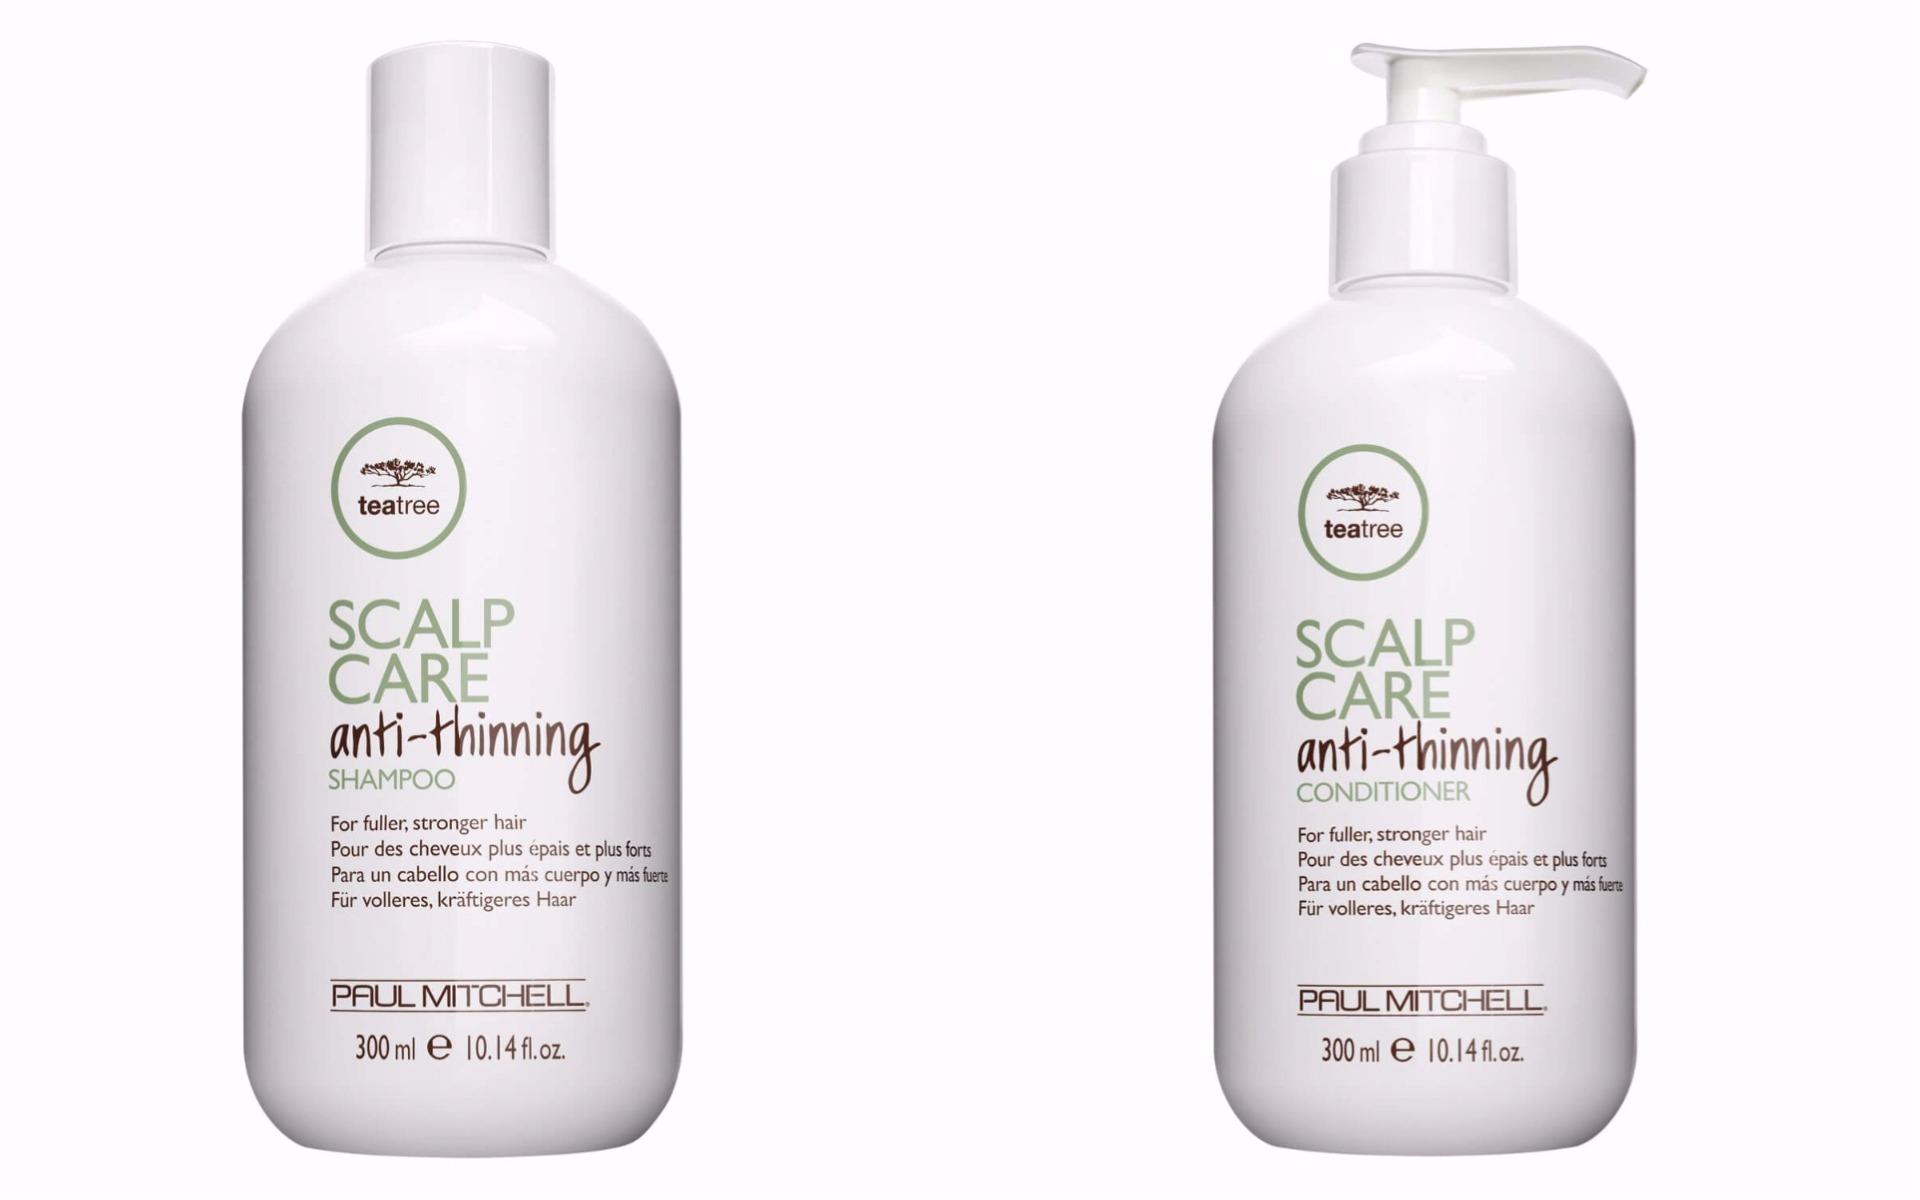 scalp-care-anti-thinning